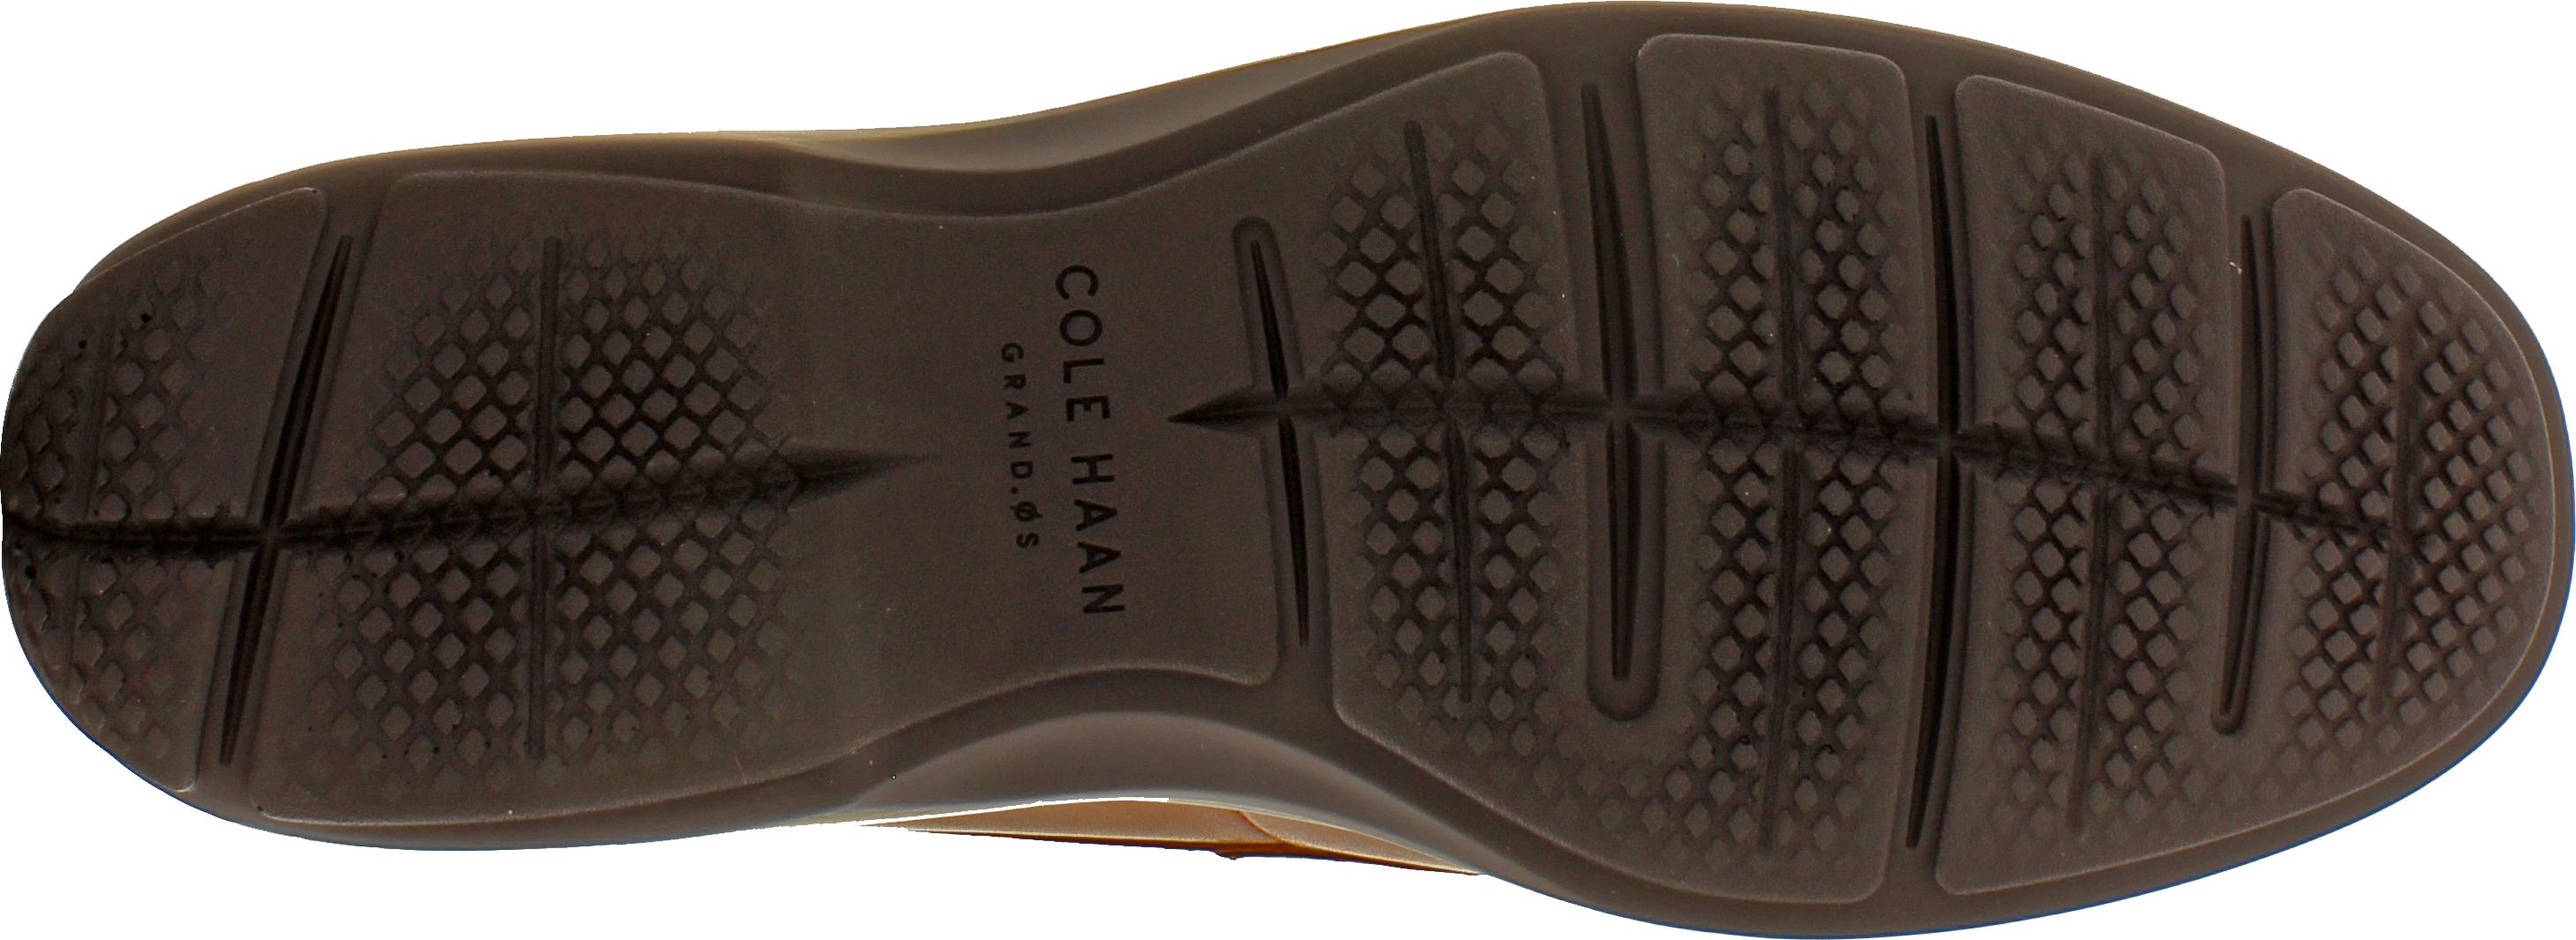 b90adc59594 Cole Haan Men s C25478 - Santa Barbara Penny Ii - The Shoe Mart